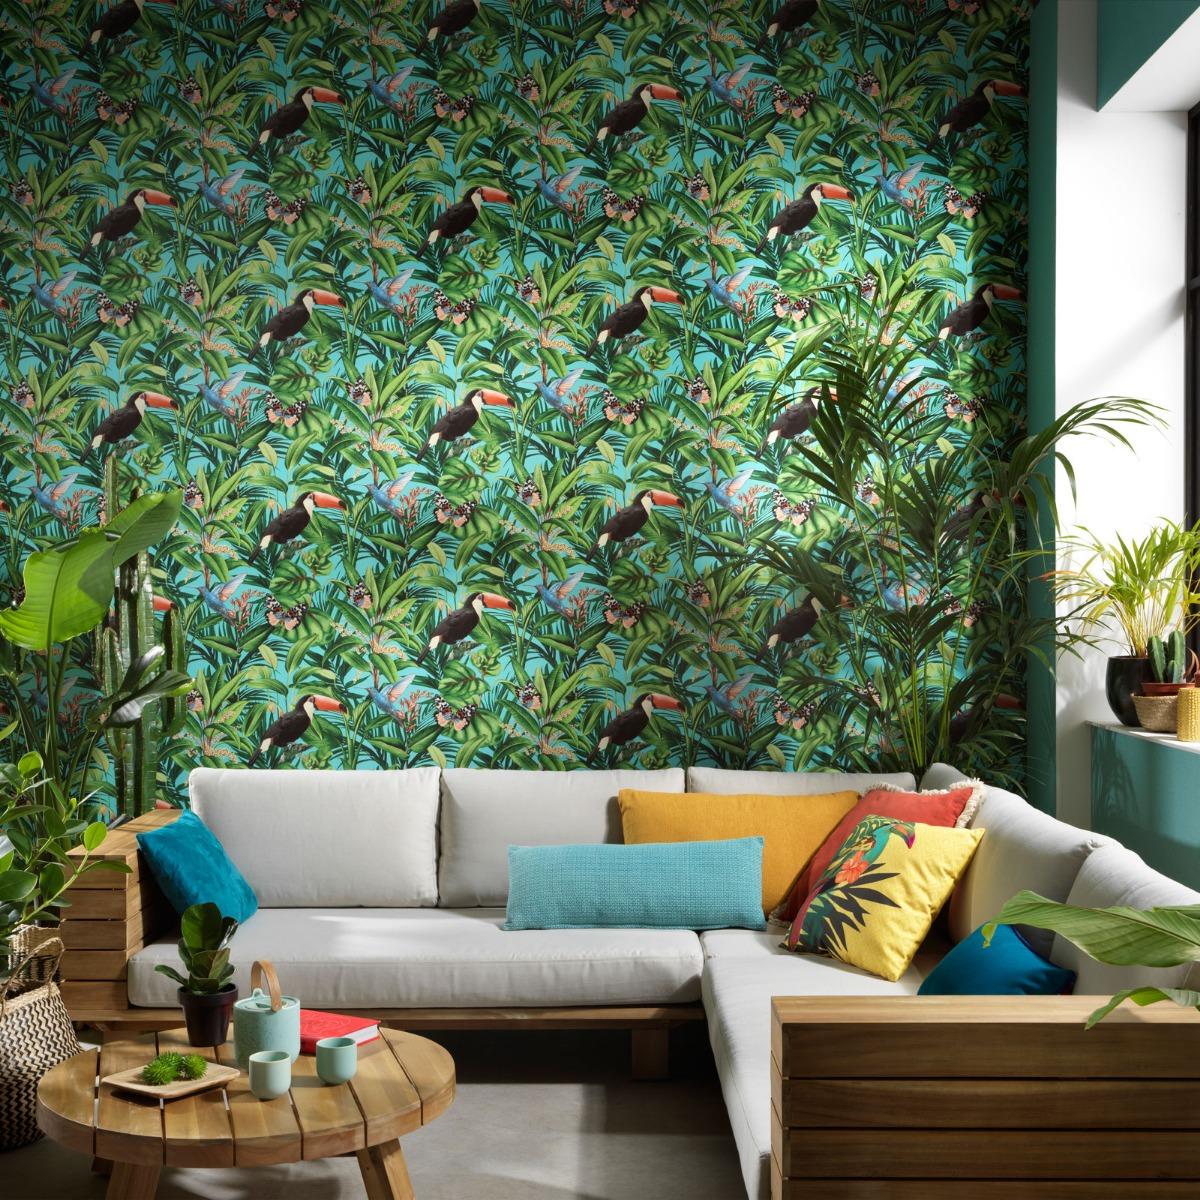 Erismann Paradisio 2 Jungle Birds Wallpaper Blue (10121-18-BUR)